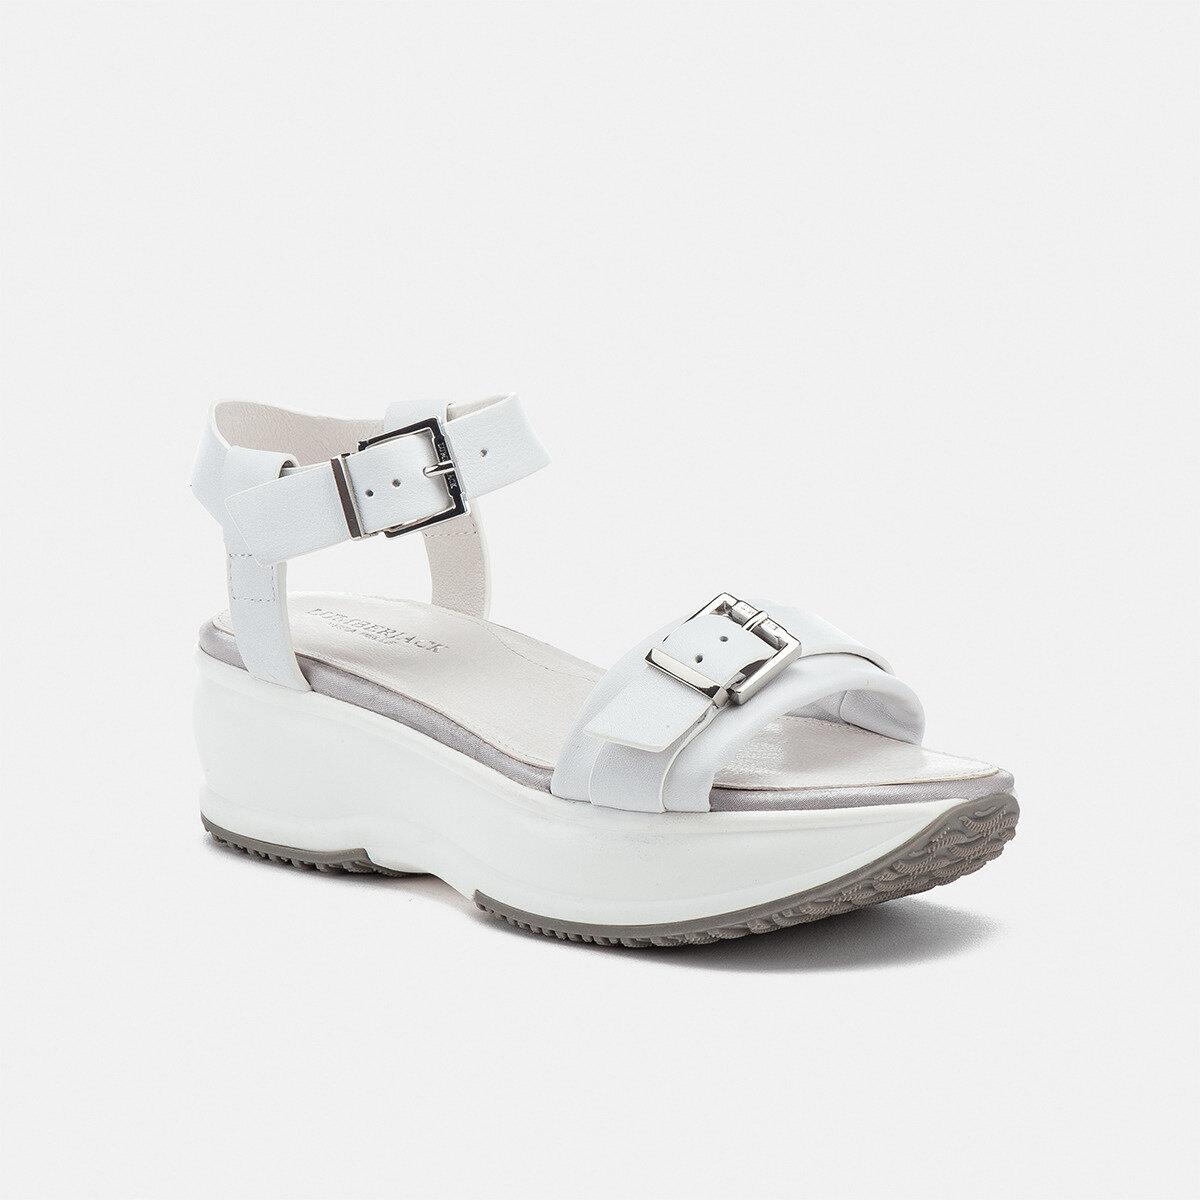 SONYA WHITE Woman Sandals